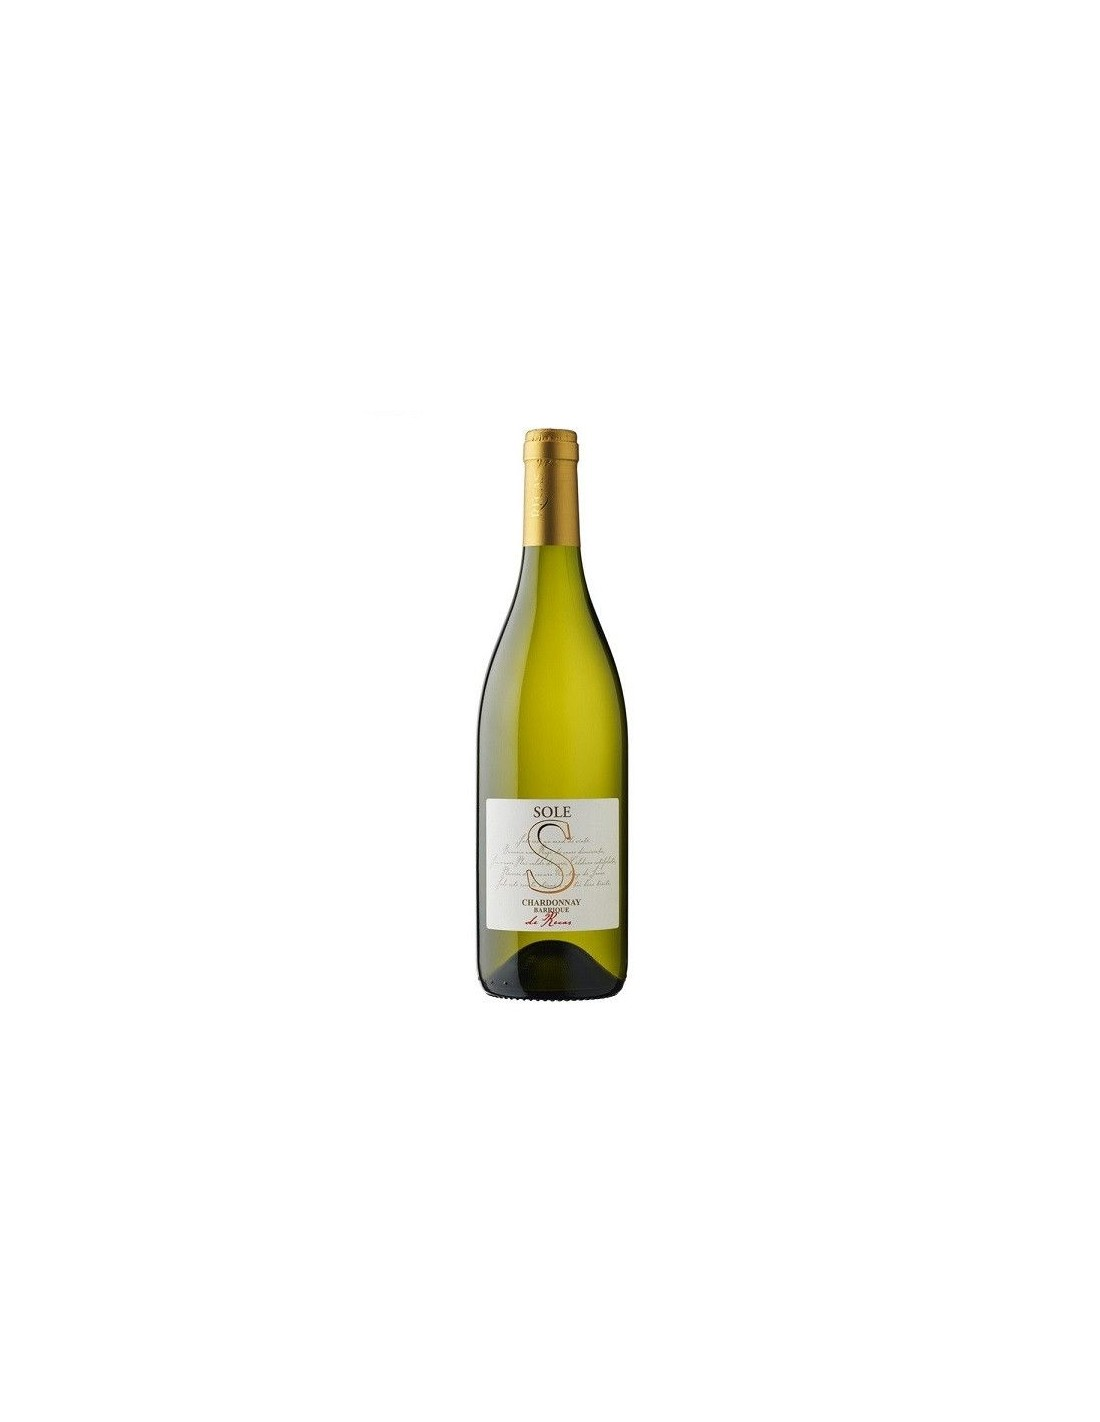 Vin alb sec, Chardonnay, Sole Recas, 0.75L, 14% alc., Romania